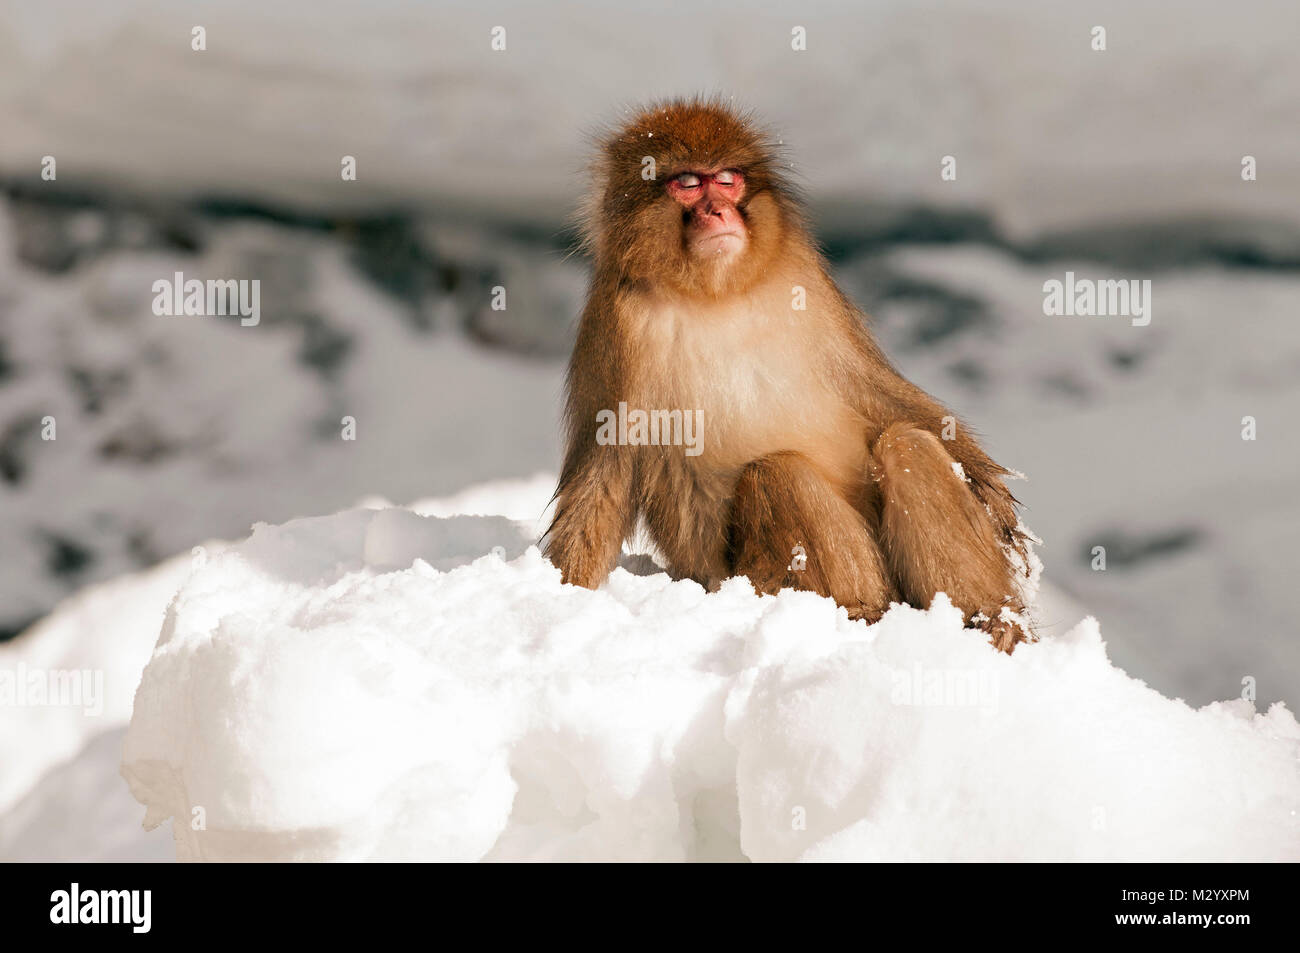 Japanese macaque or snow japanese monkey (Macaca fuscata) sunbath, Japan - Stock Image